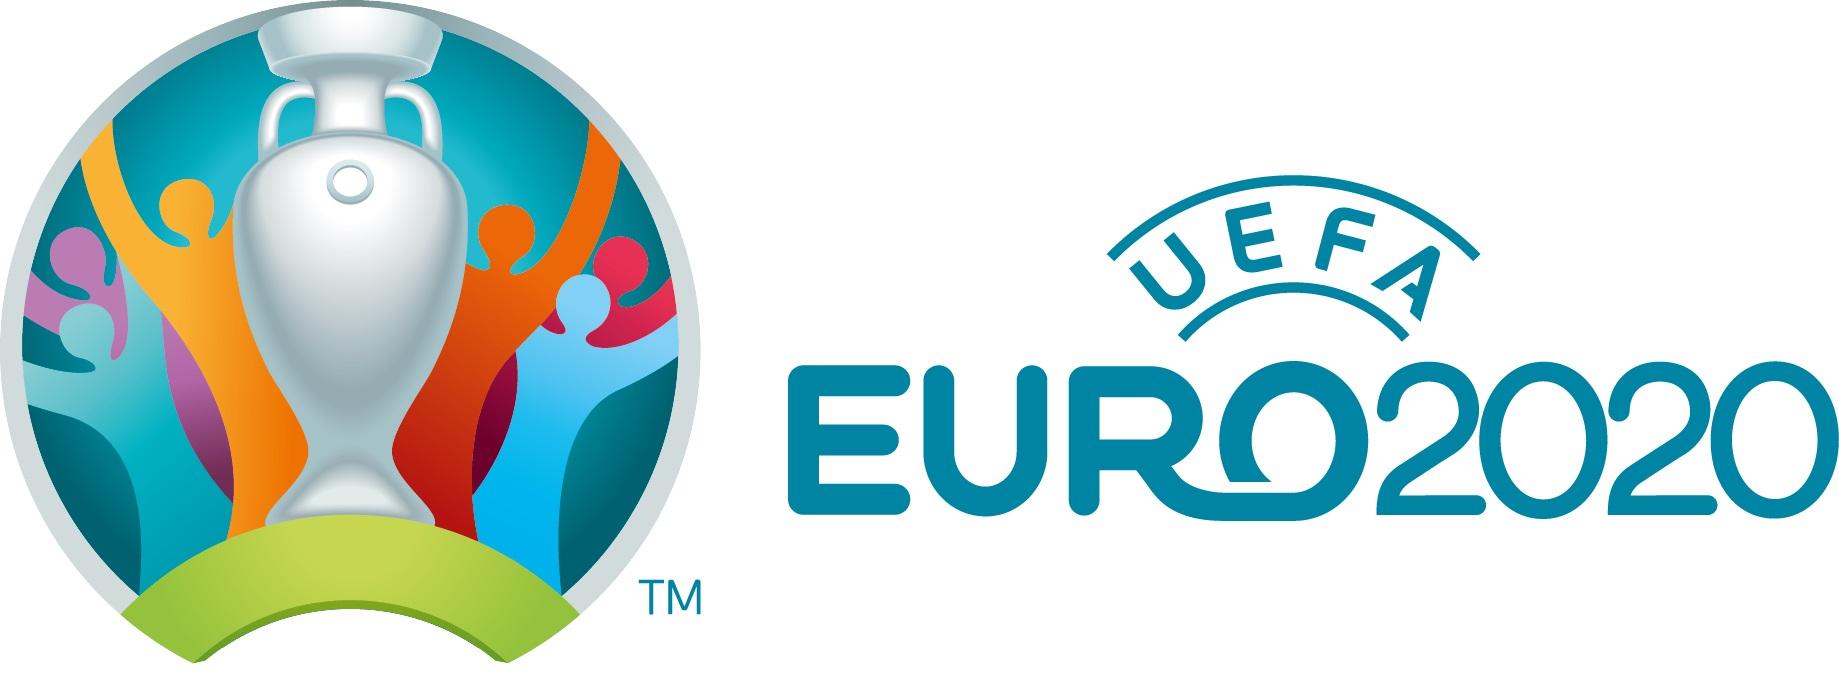 The Uefa Euro 2020 Logo - Uefa Euro 2017 Vector, Transparent background PNG HD thumbnail